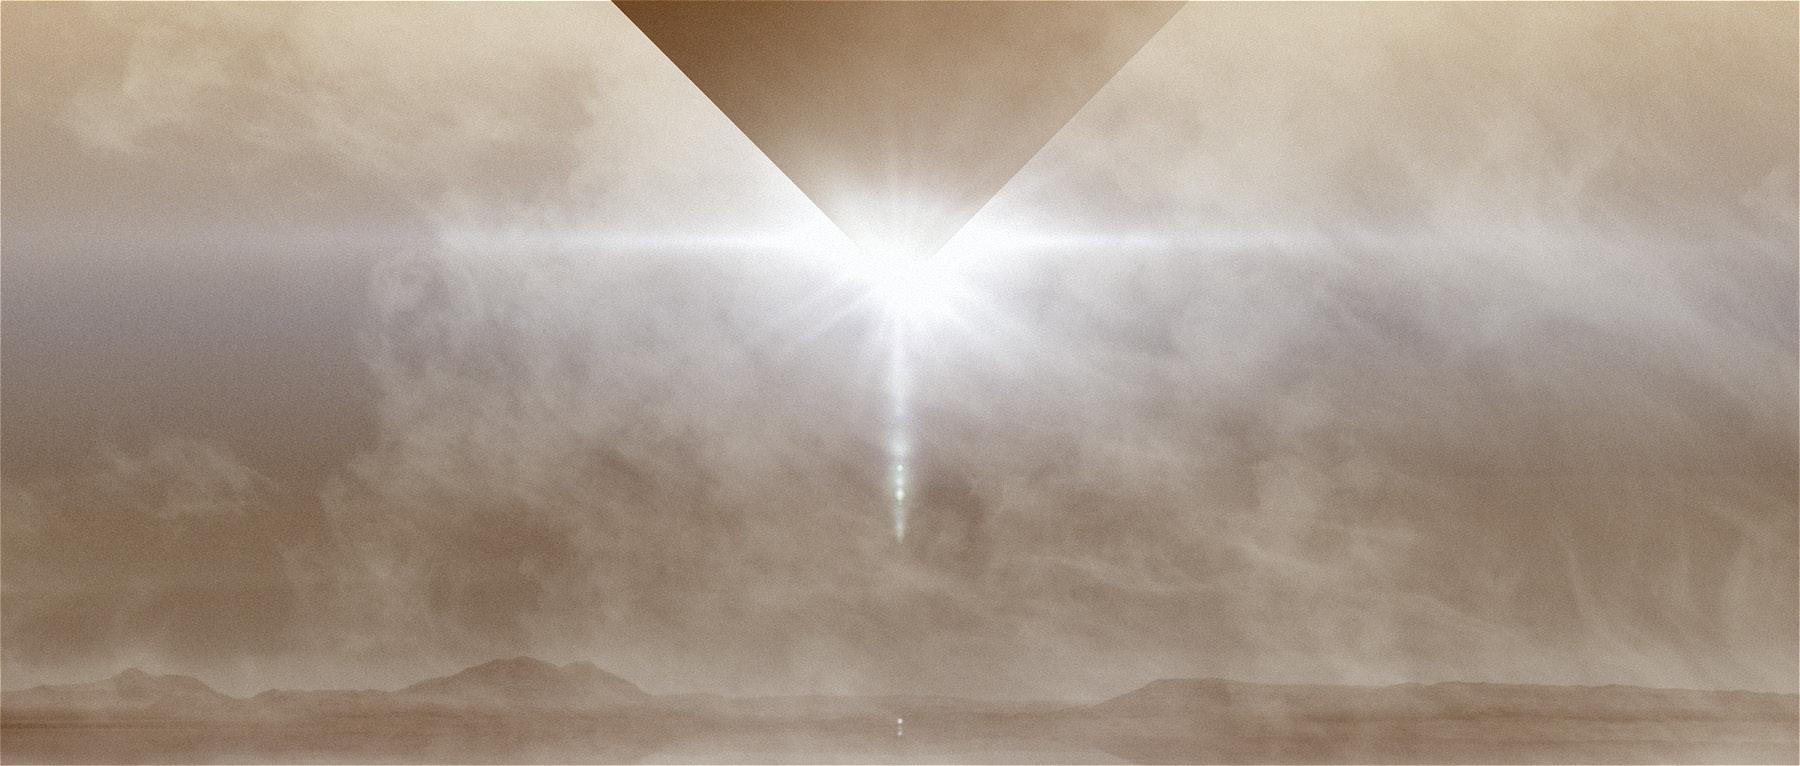 Oblivion_02_00000.jpg